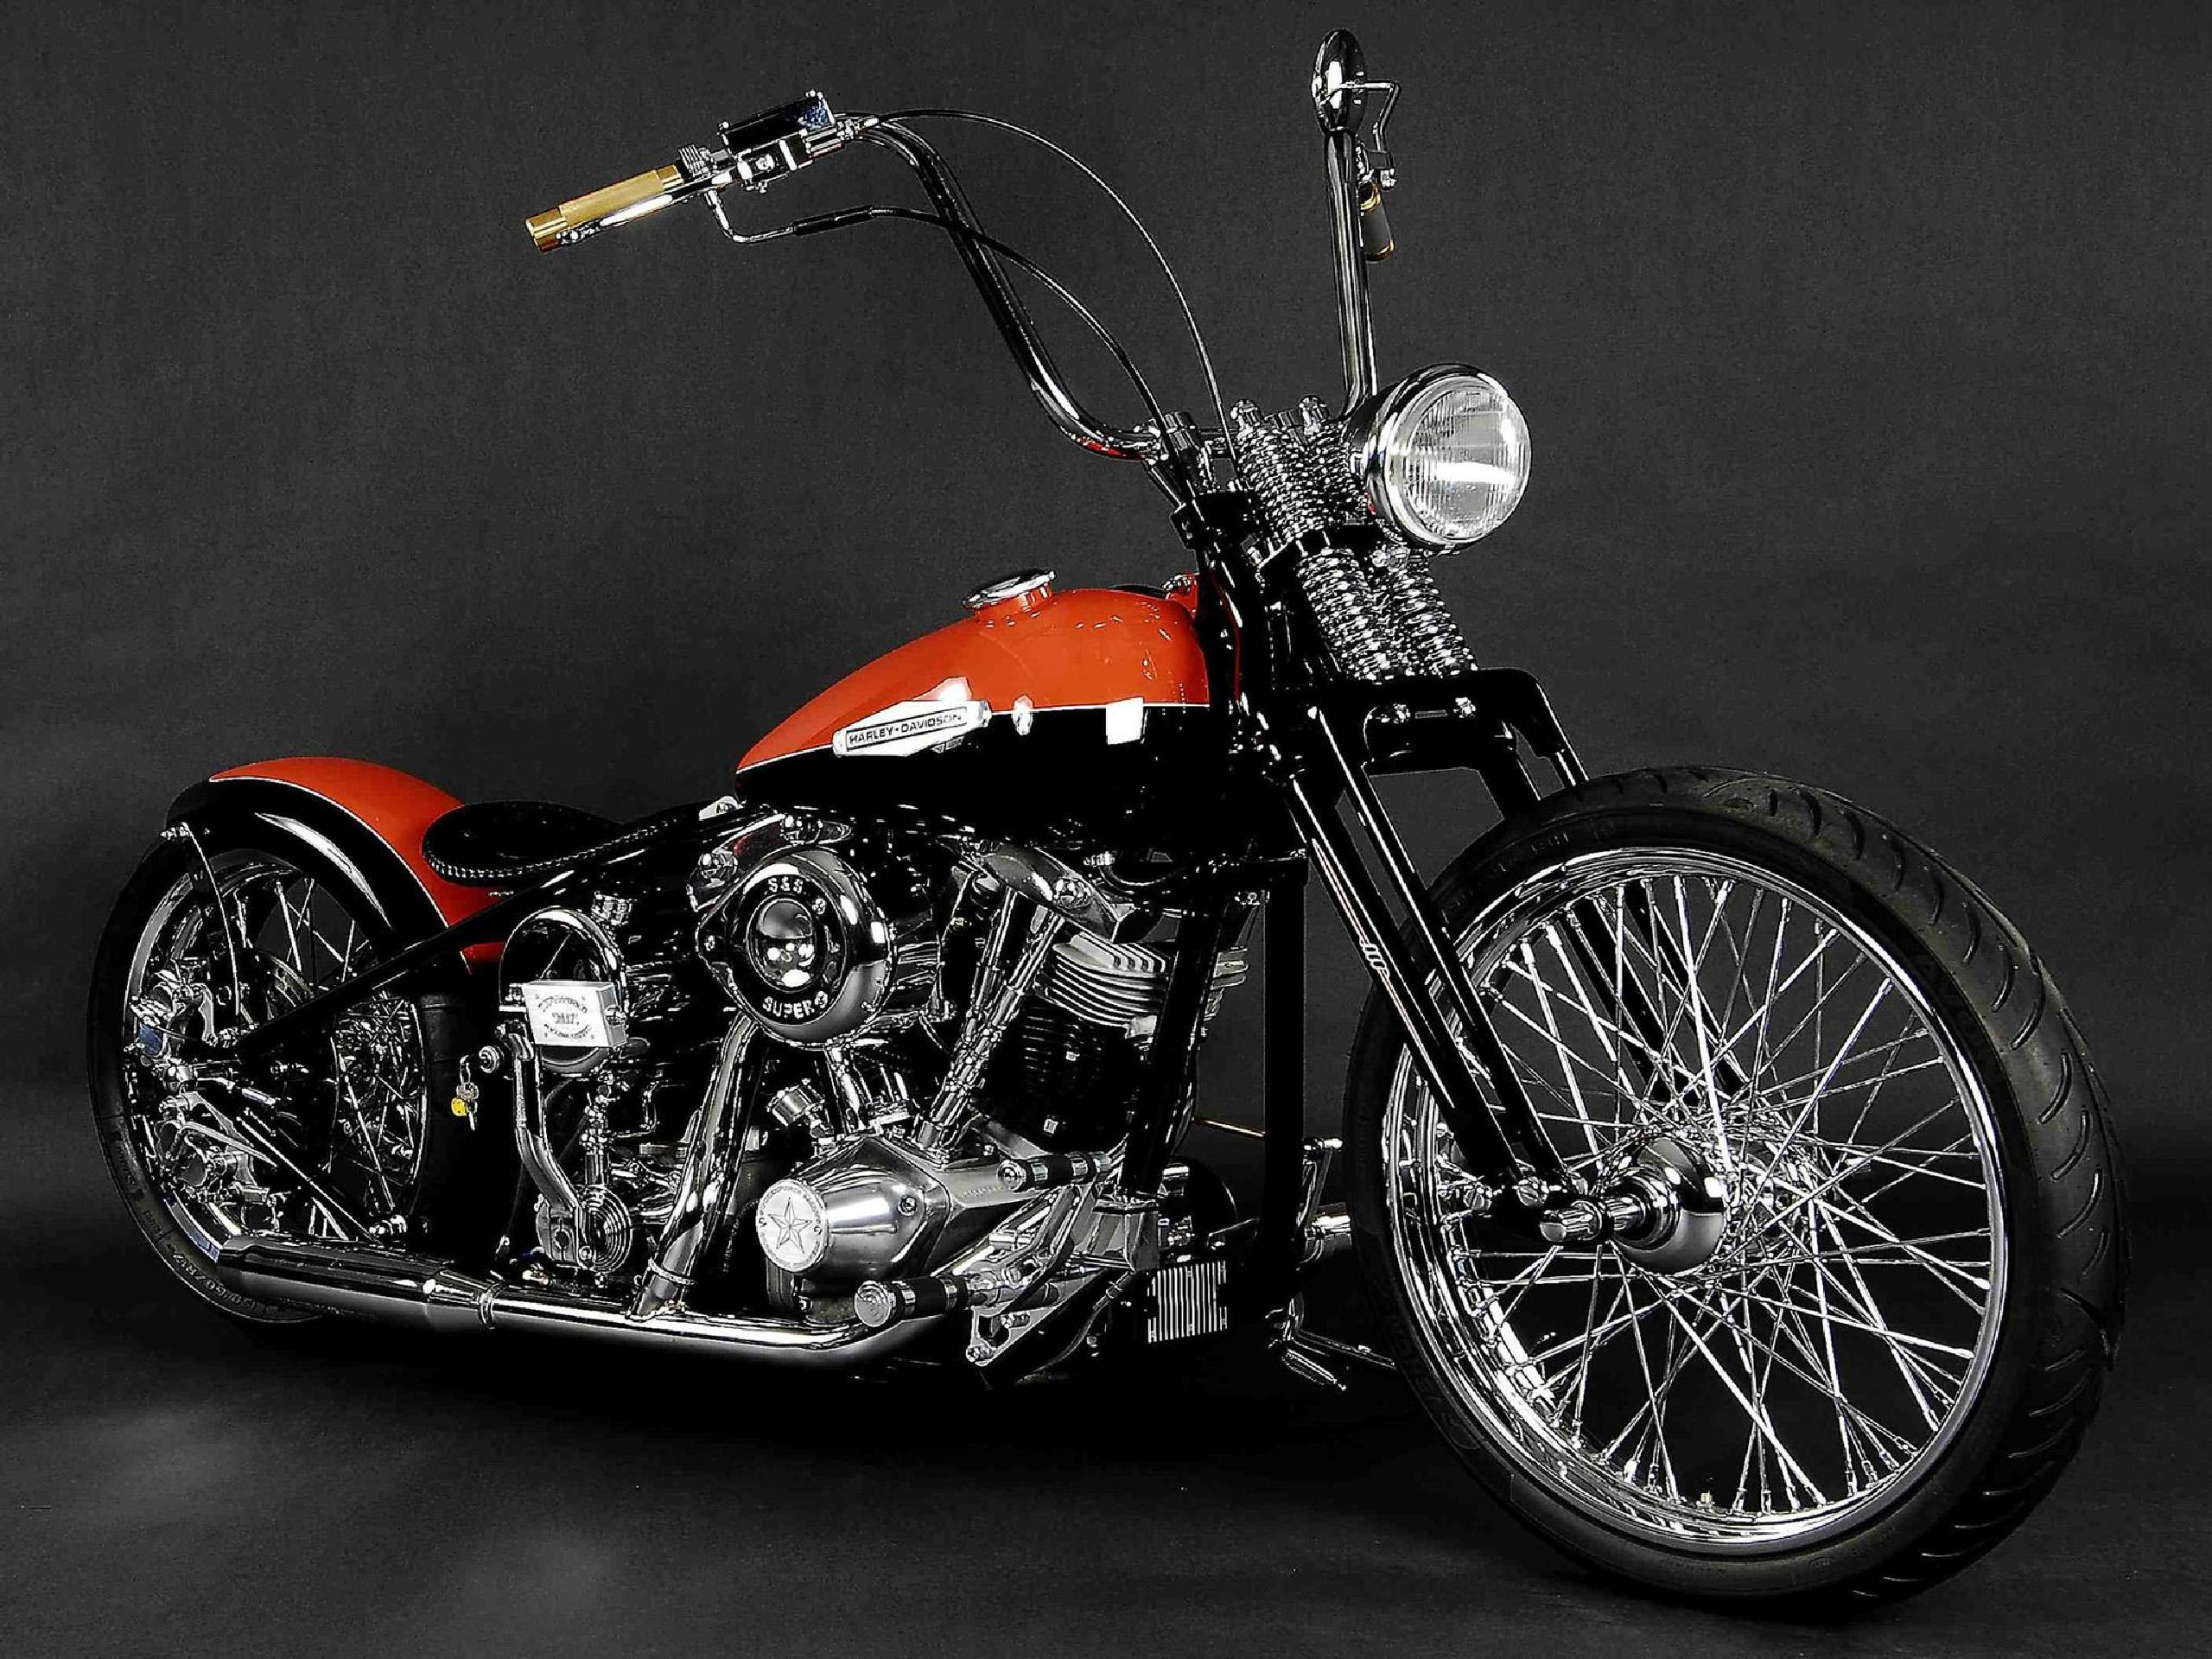 Harley Davidson Wallpapers Hd Best Bikes Pictures By Atit: Free Harley Davidson Desktop Wallpapers